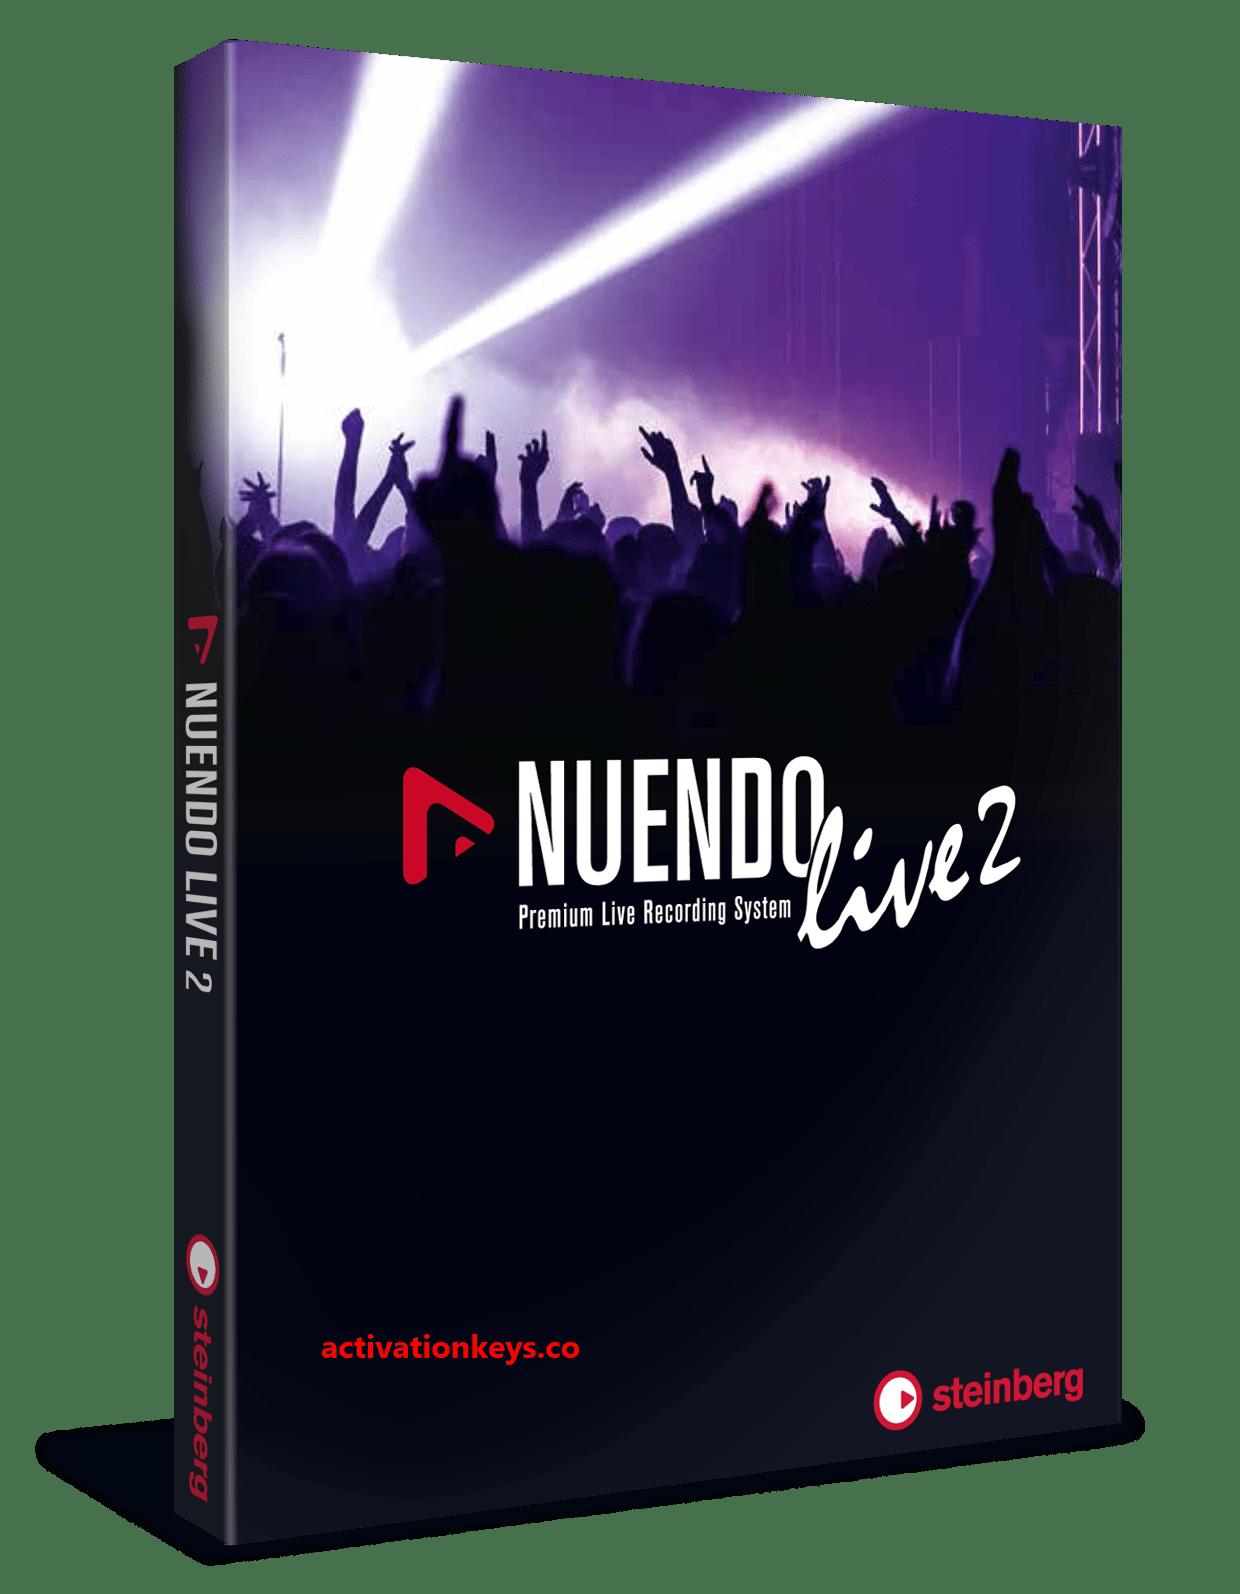 Steinberg Nuendo 8 3 20 Crack With Key Full Version Free